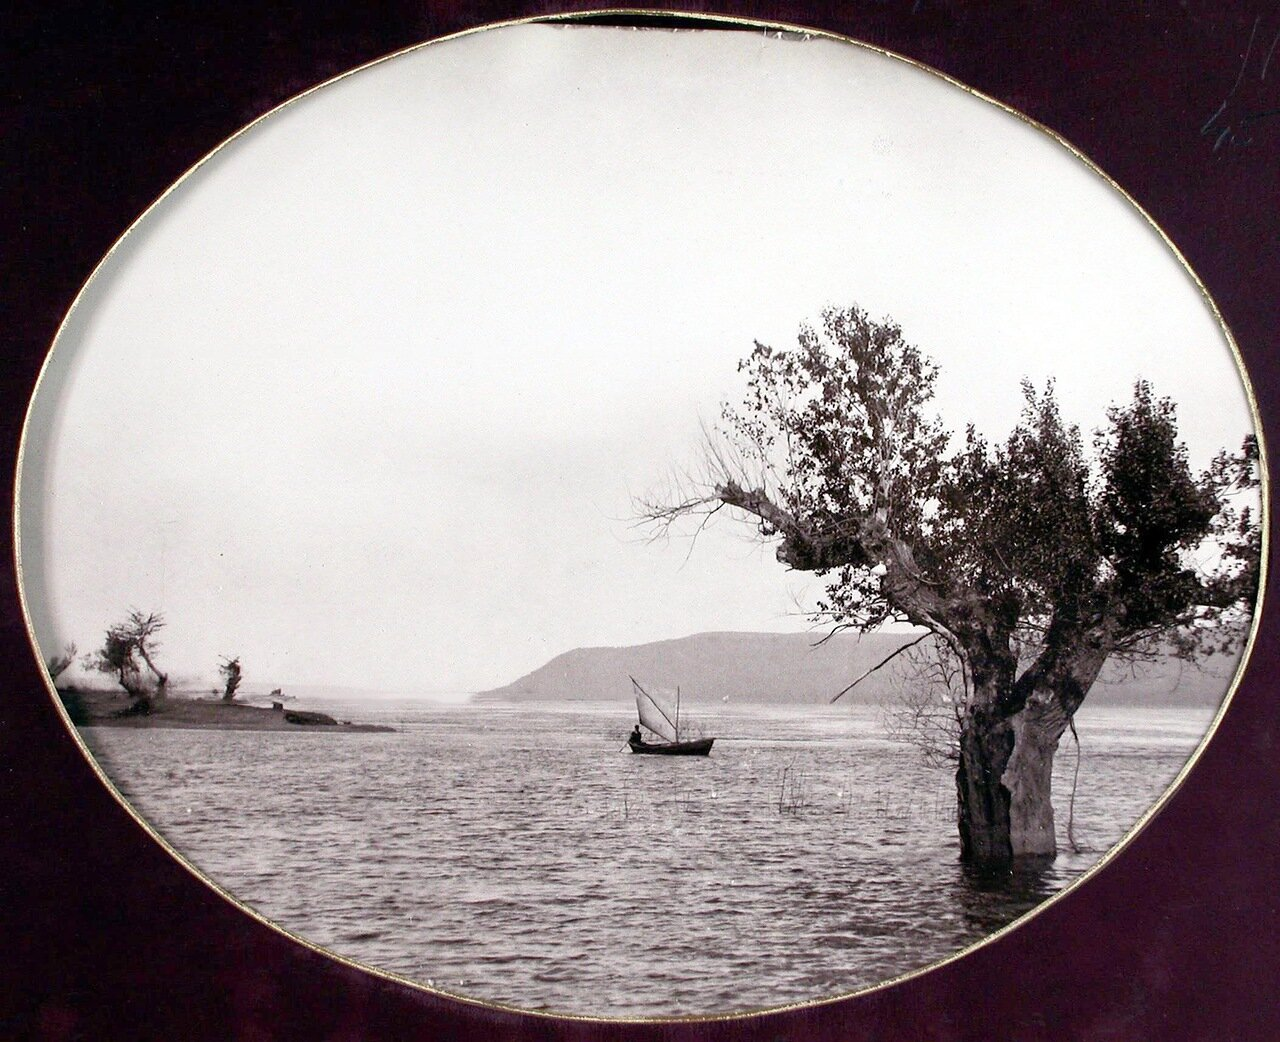 22. Вид на Волгу во время разлива у Жигулевских ворот